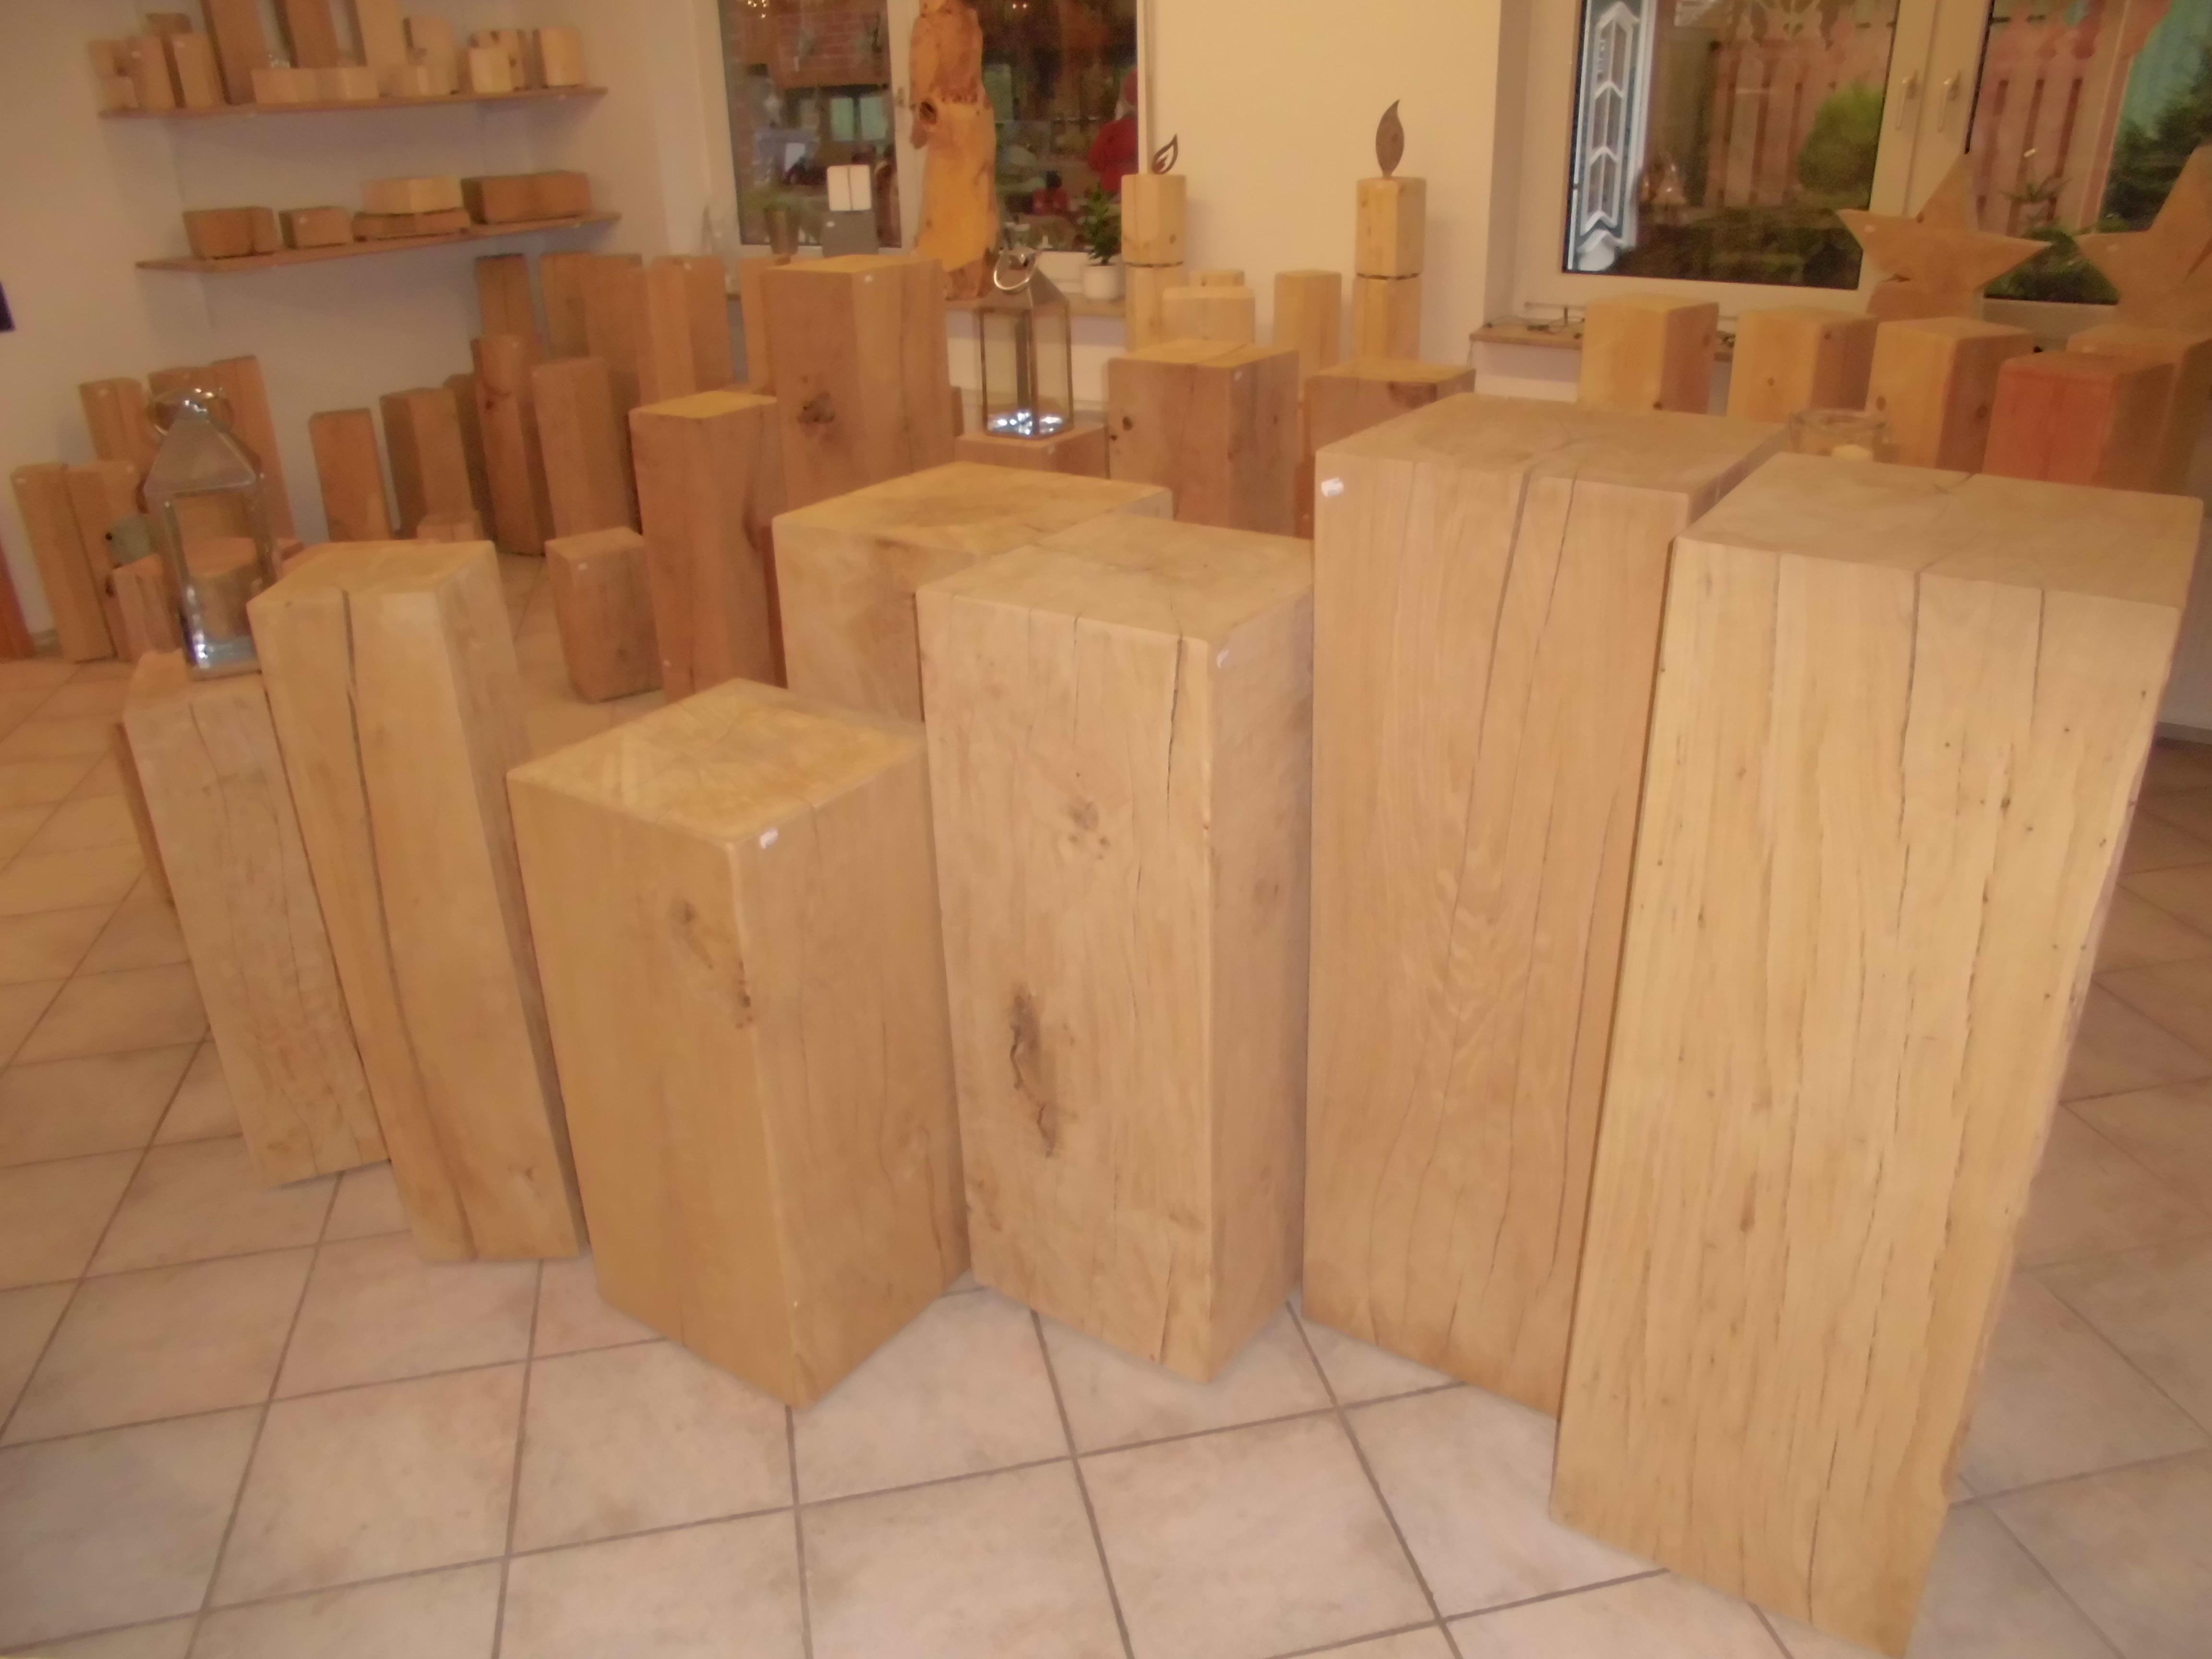 Eichenholzsäule gehobelt, geschliffen, angefast 30x30x45cm